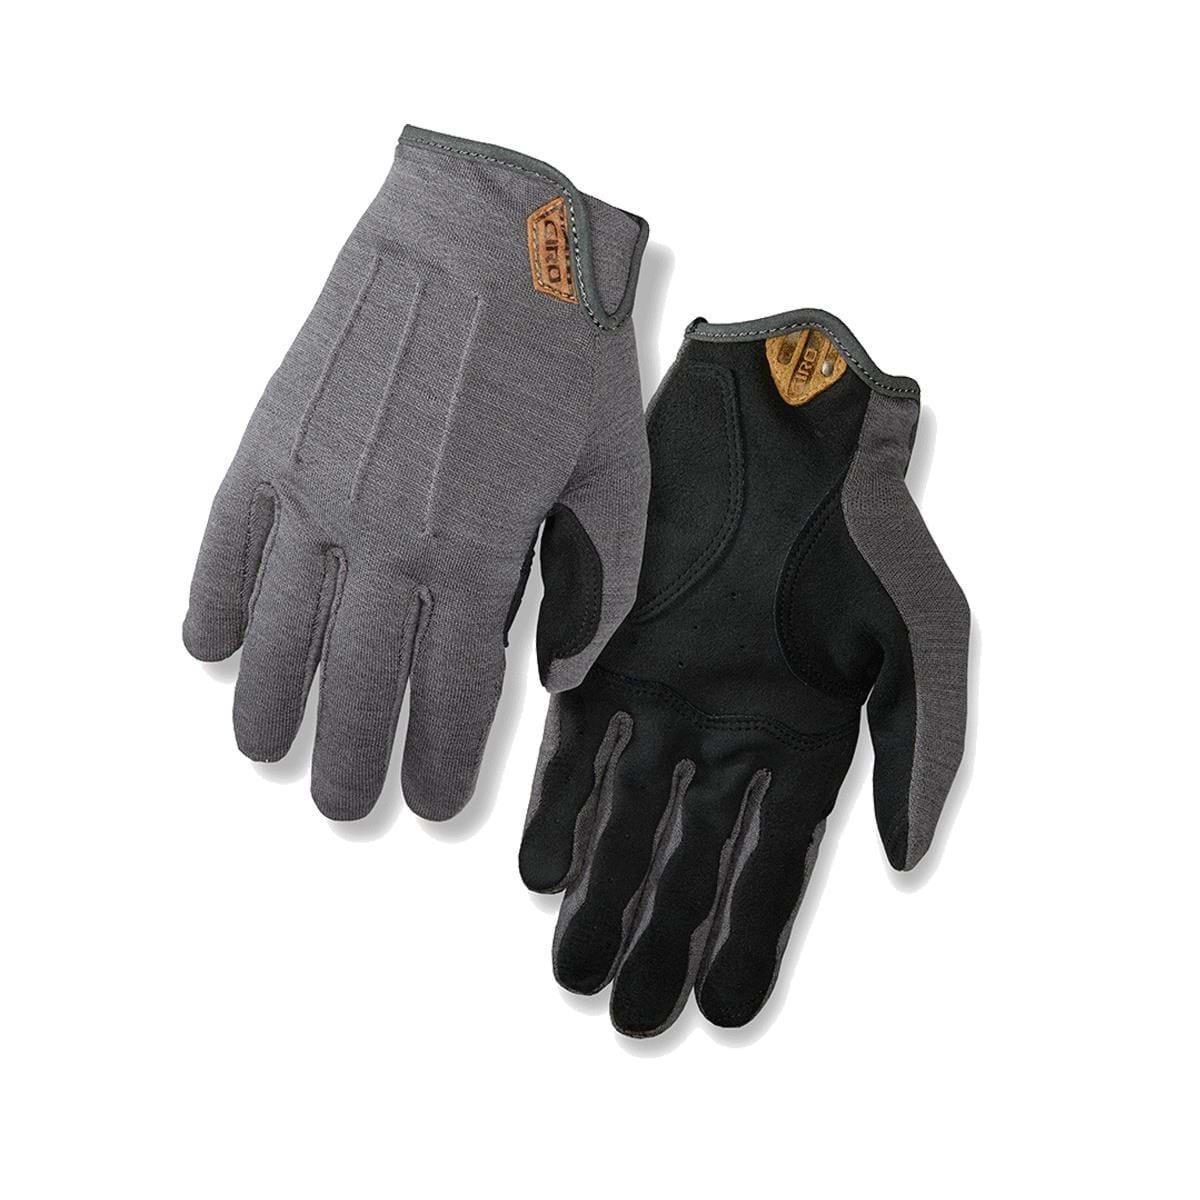 D'Wool MTB/Gravel Cycling Gloves